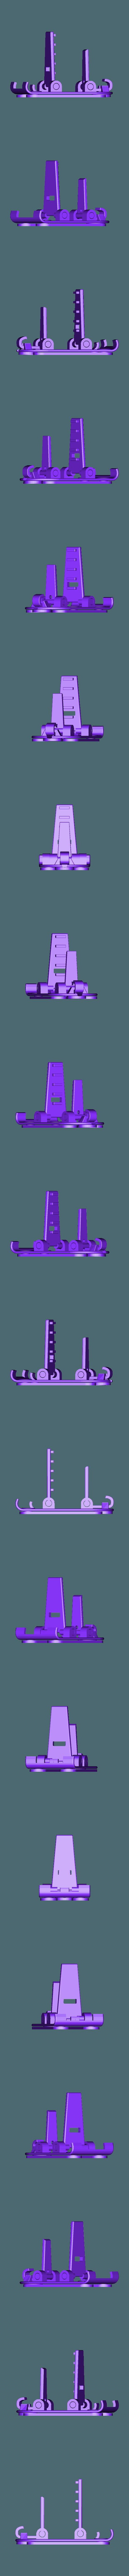 AMF_Belly_Tablet_Stand_v4.stl Download free STL file Adjustable Belly Tablet Stand • 3D printable template, dancingchicken